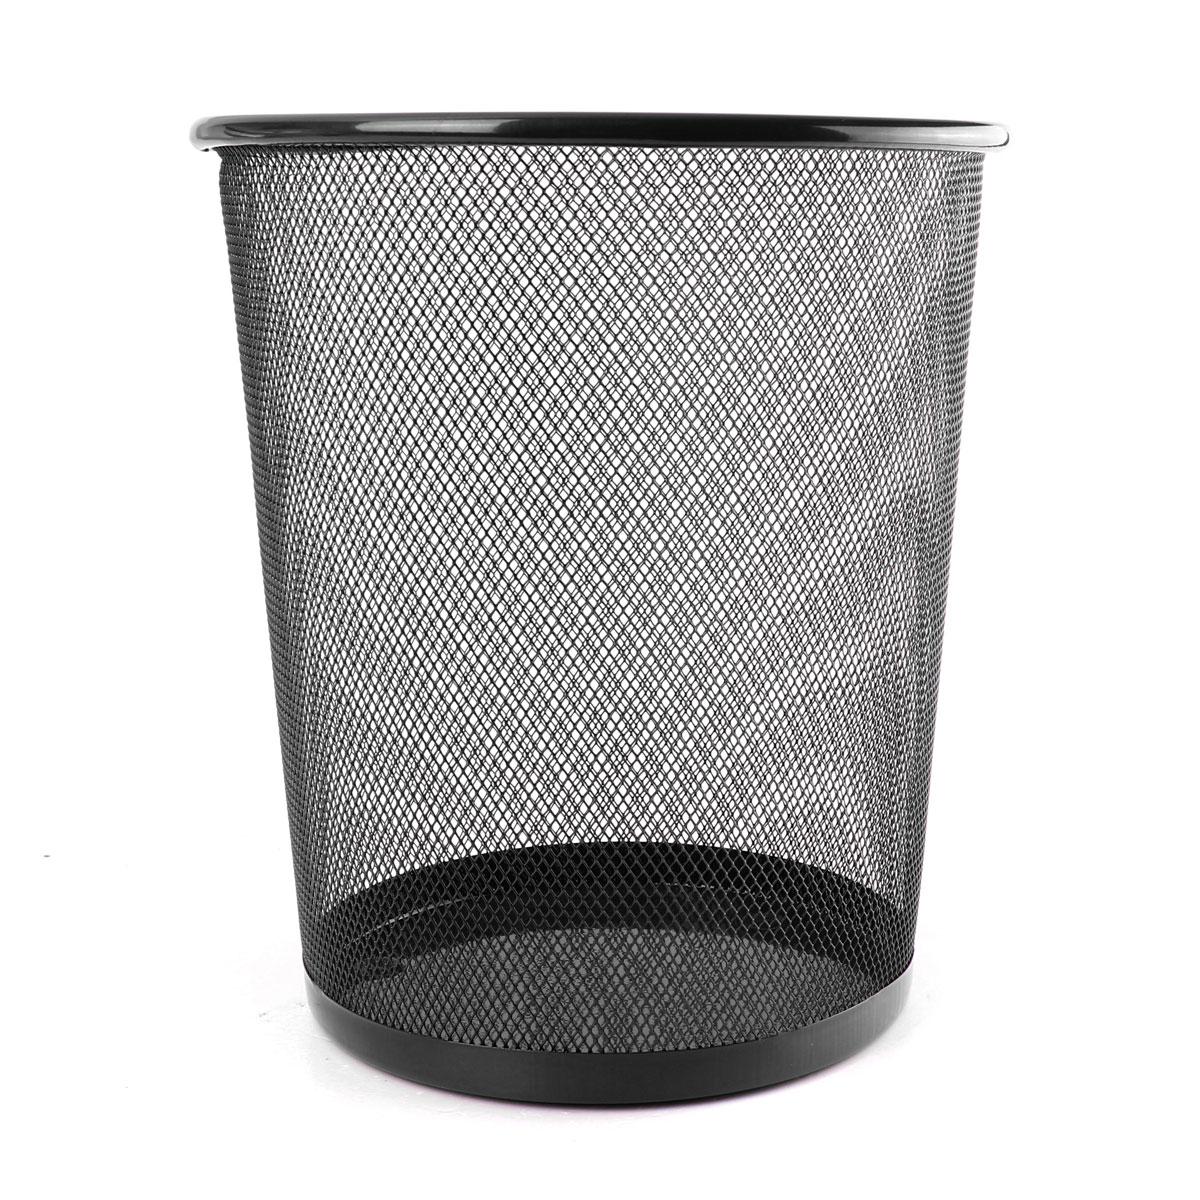 1x Sponge Cone Metal Polishing Foam Pad Wool Buffing: Office Can Metal Mesh Waste Bin Wastebasket Rubbish Paper